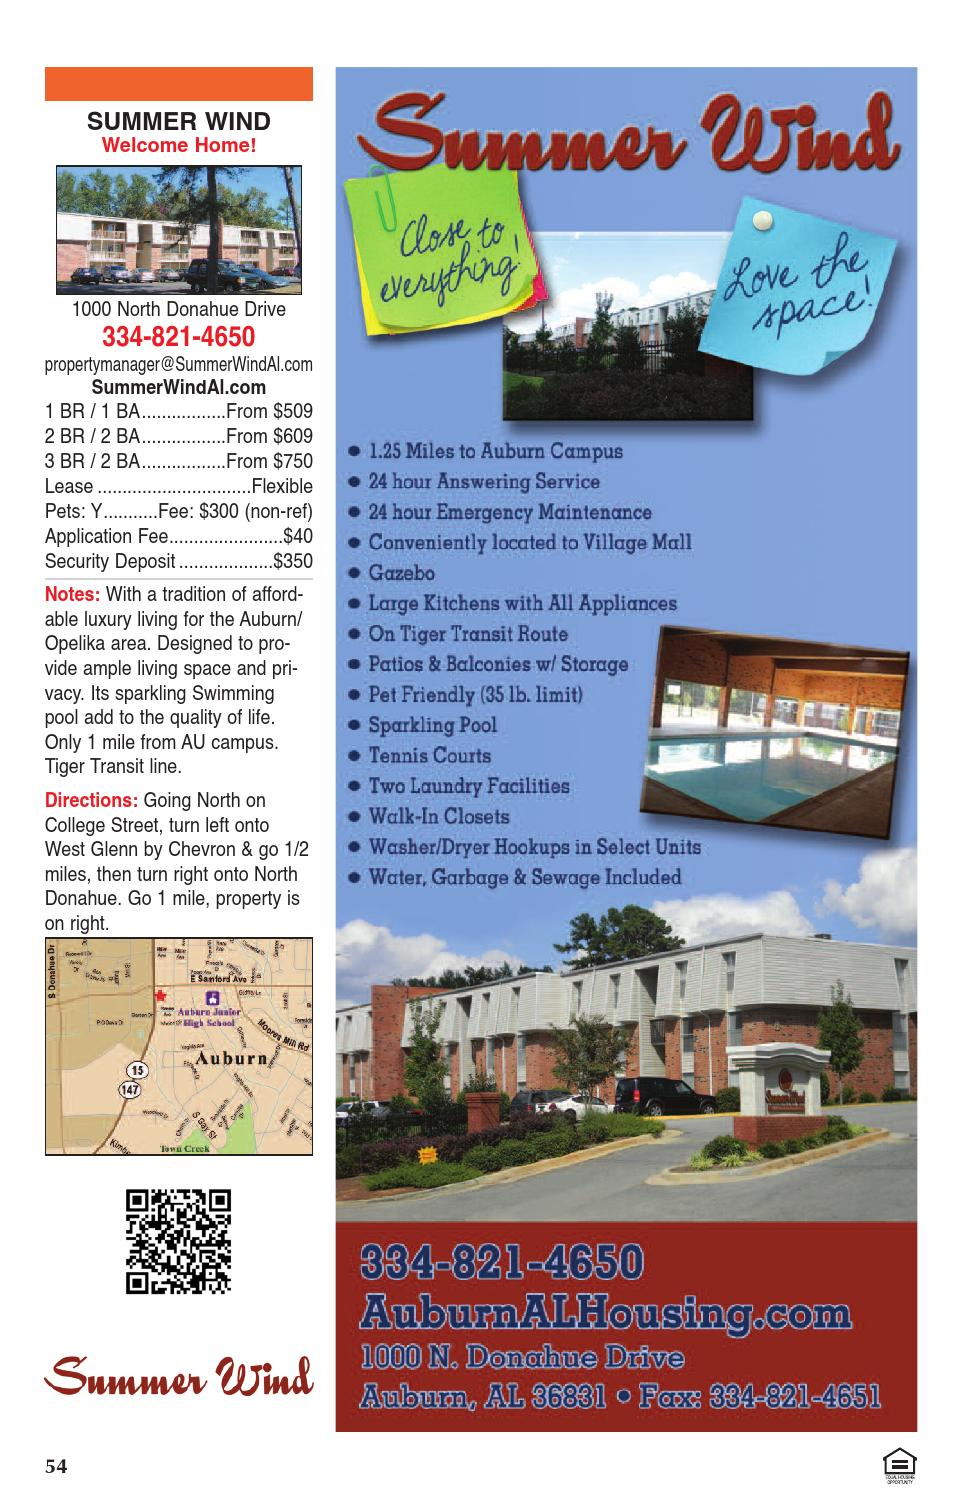 Auburn Opelika Apartment Guide Spring Summer 2016 By Jim Andrews